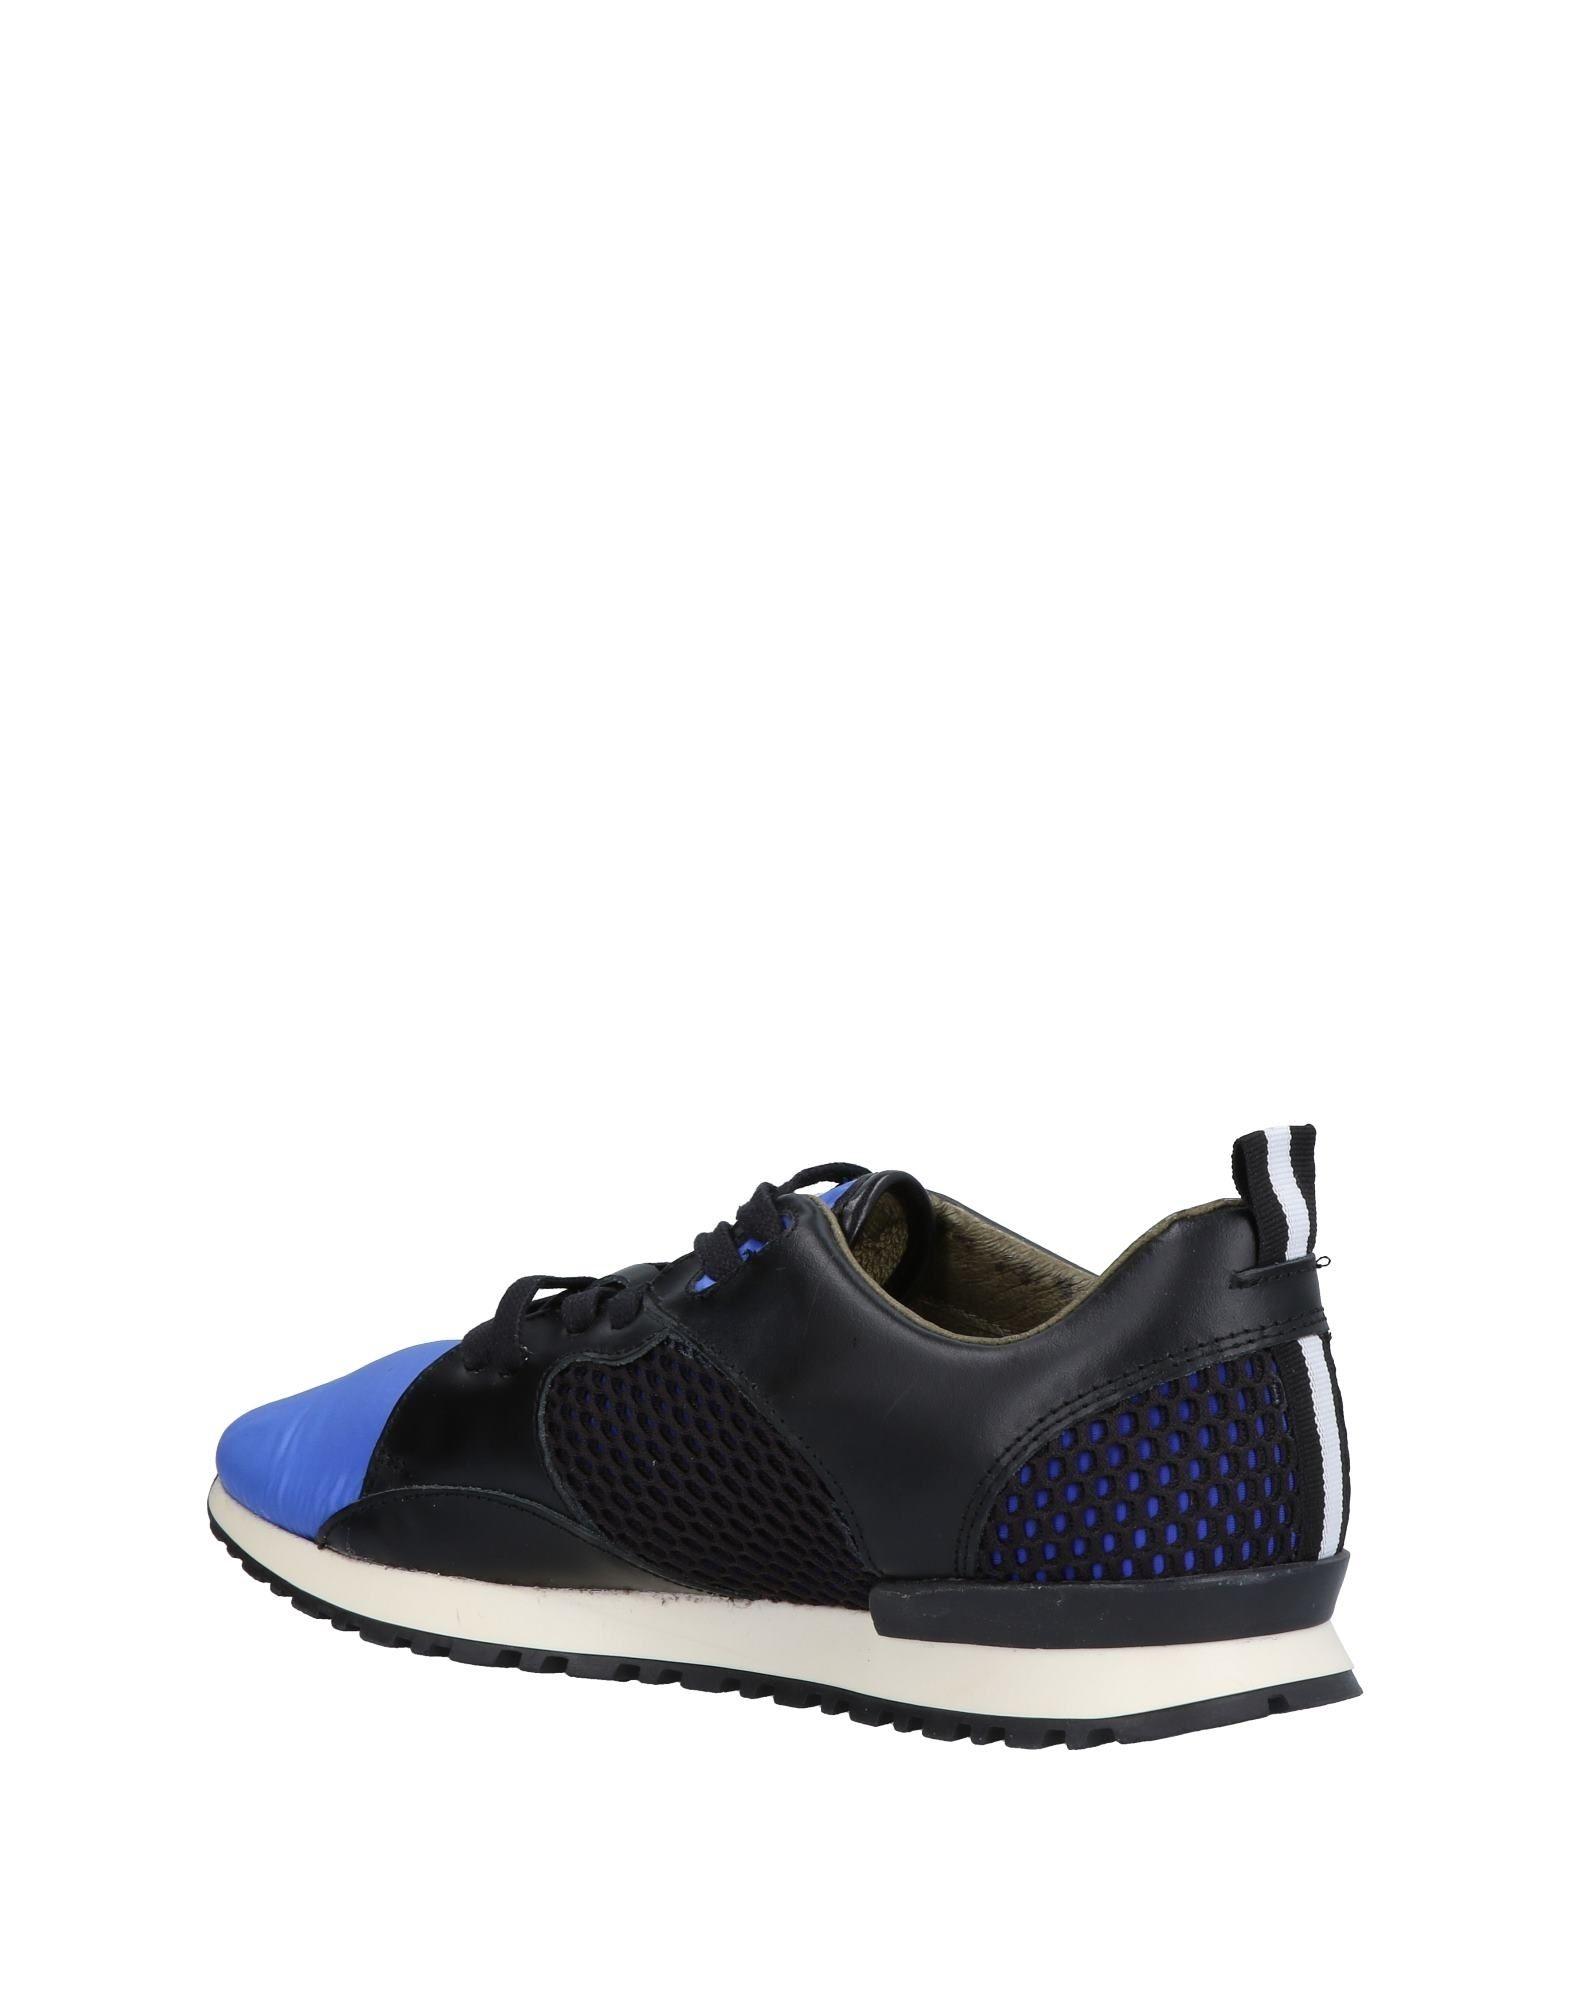 D.A.T.E. Sneakers Schuhe Damen  11484572AJ Heiße Schuhe Sneakers a159be